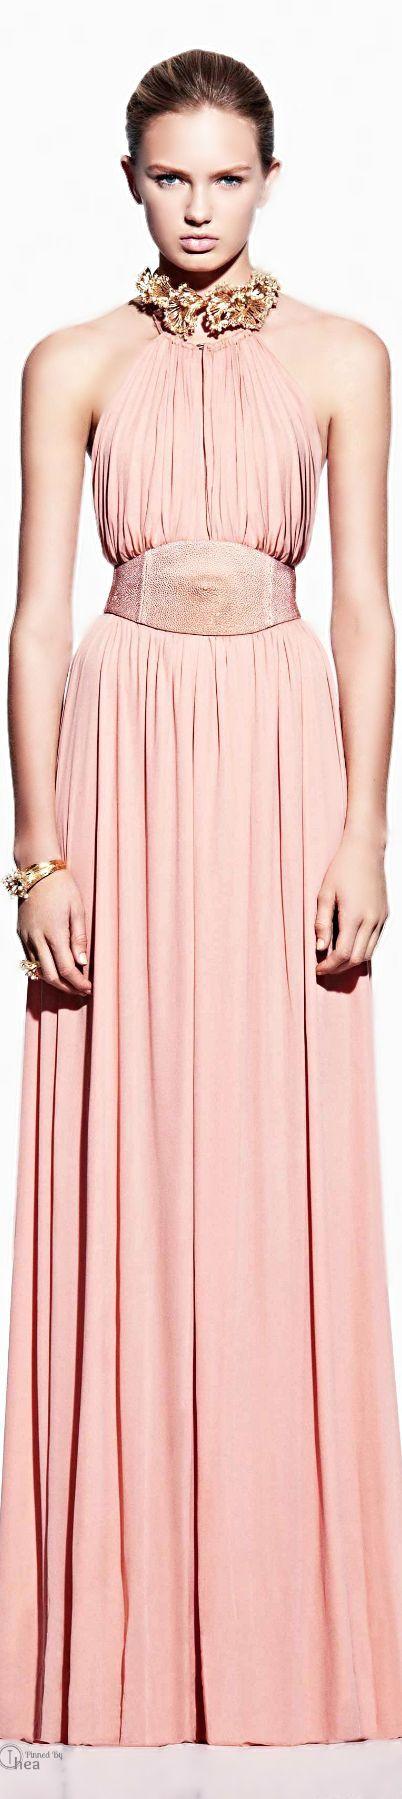 17 best Robes mariée images on Pinterest | Homecoming dresses straps ...